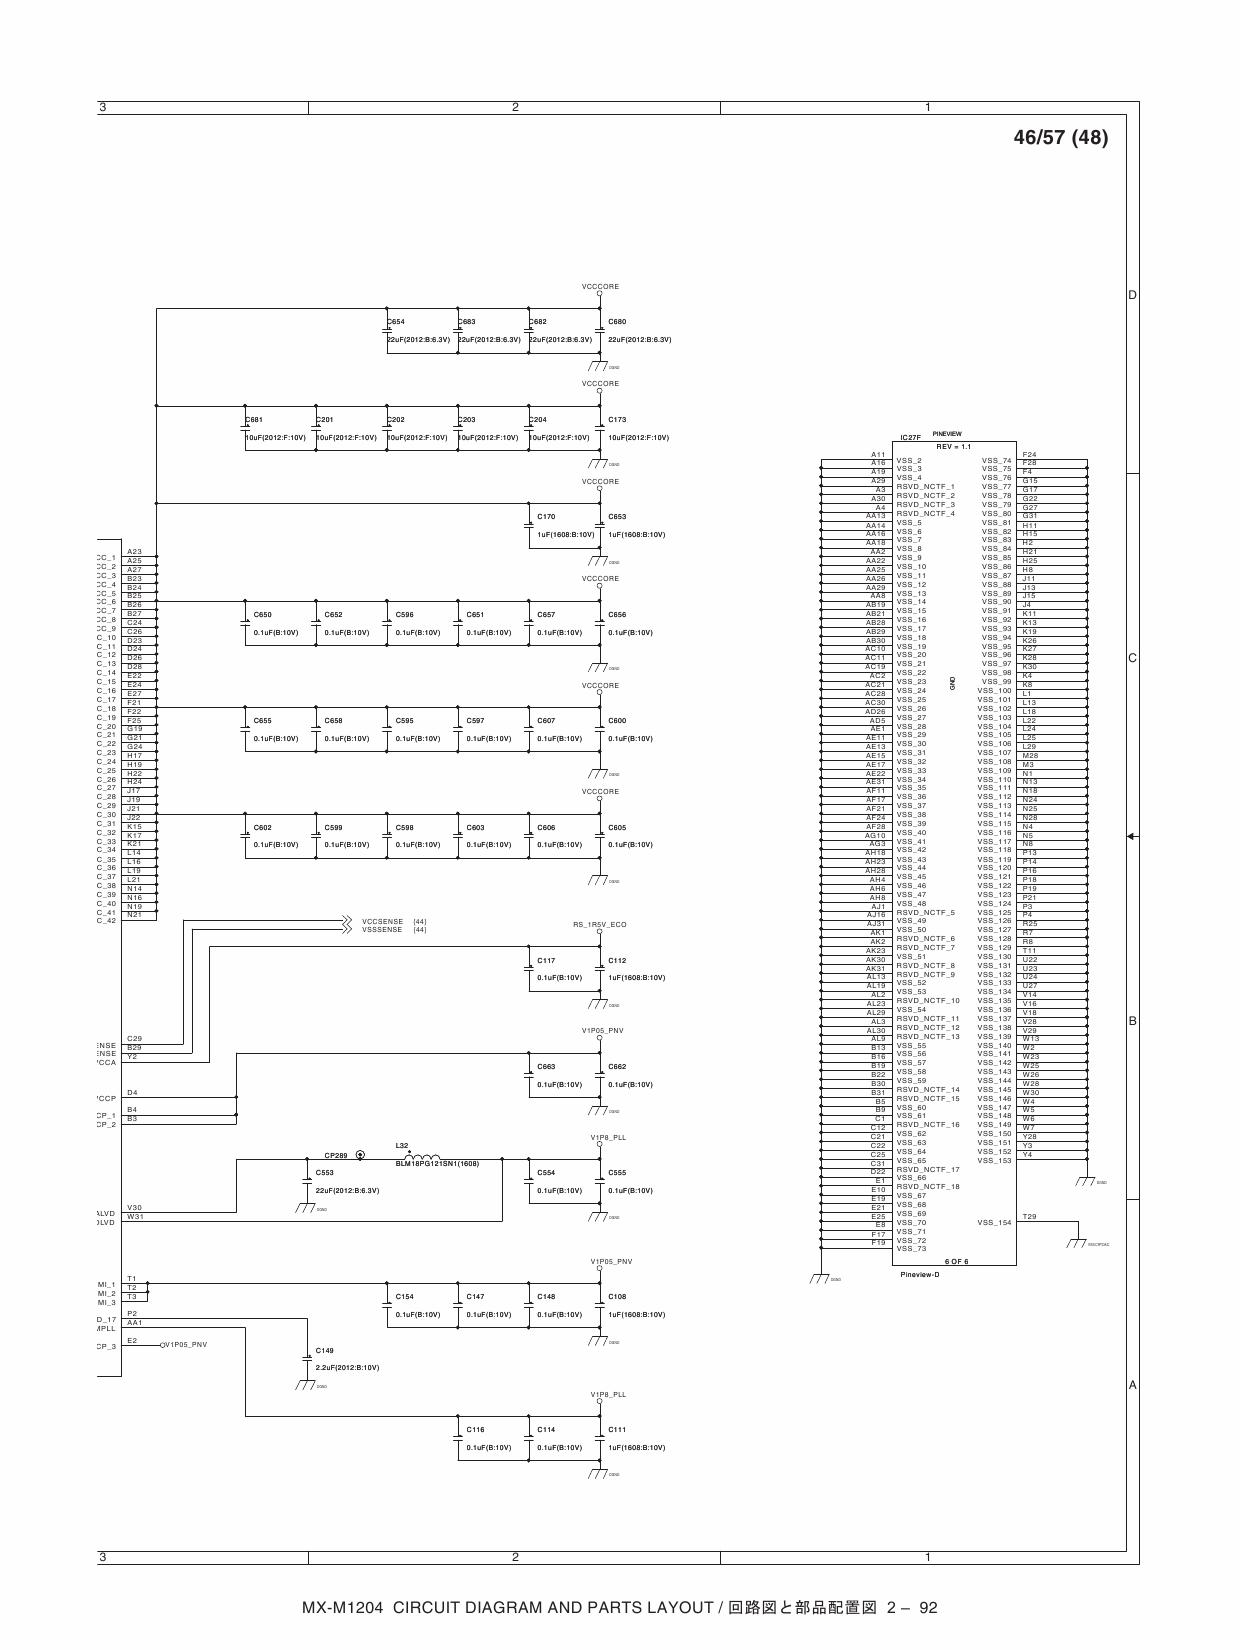 sharp mx m904 m1054 m1204 circuit diagrams